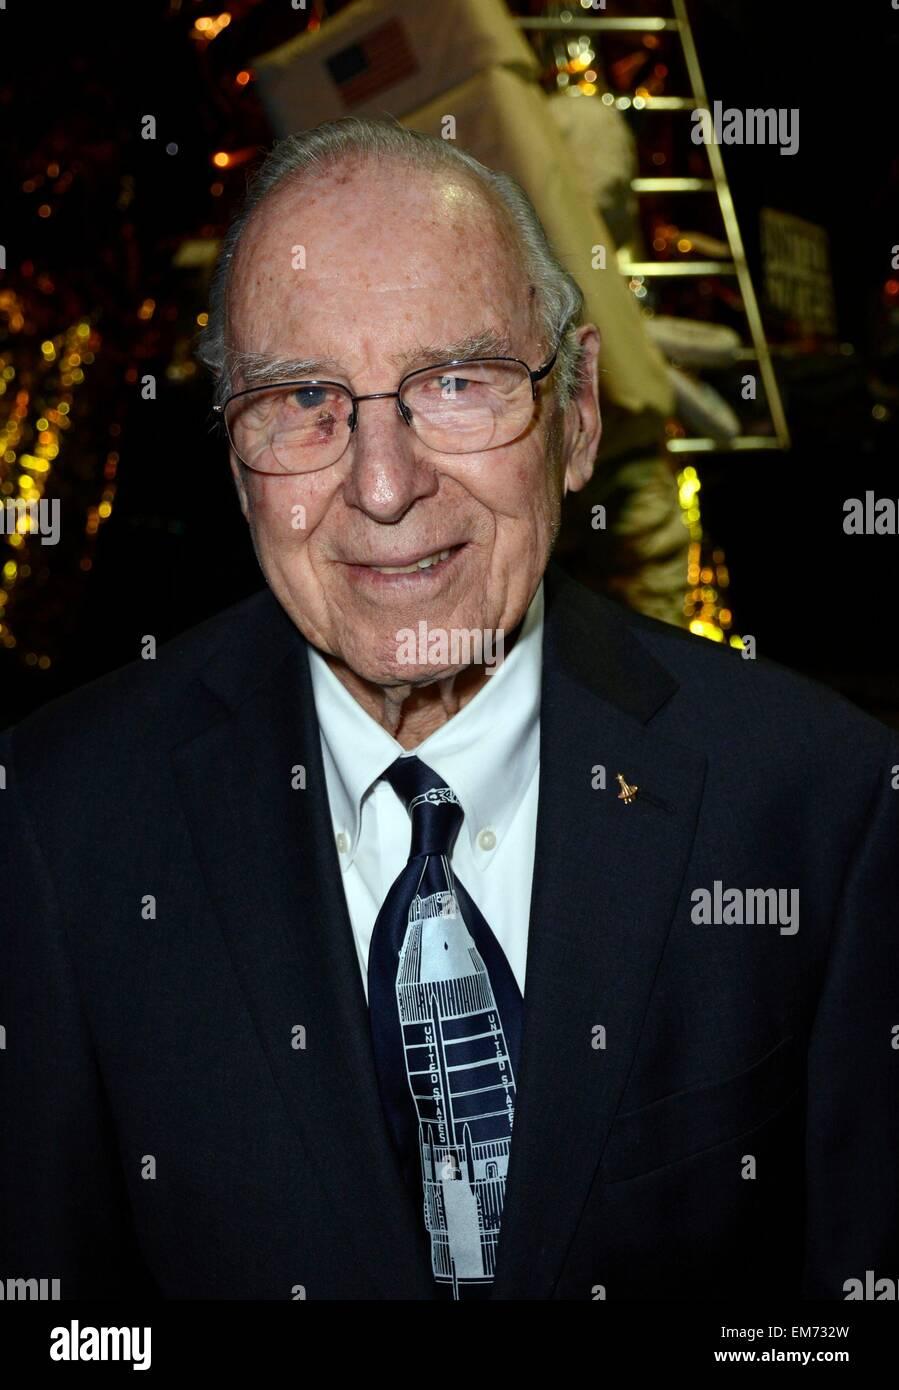 Garden City, NY, USA. 16th Apr, 2015. Jim Lovell in attendance for Apollo 13 45th Anniversary Reunion Celebration, - Stock Image